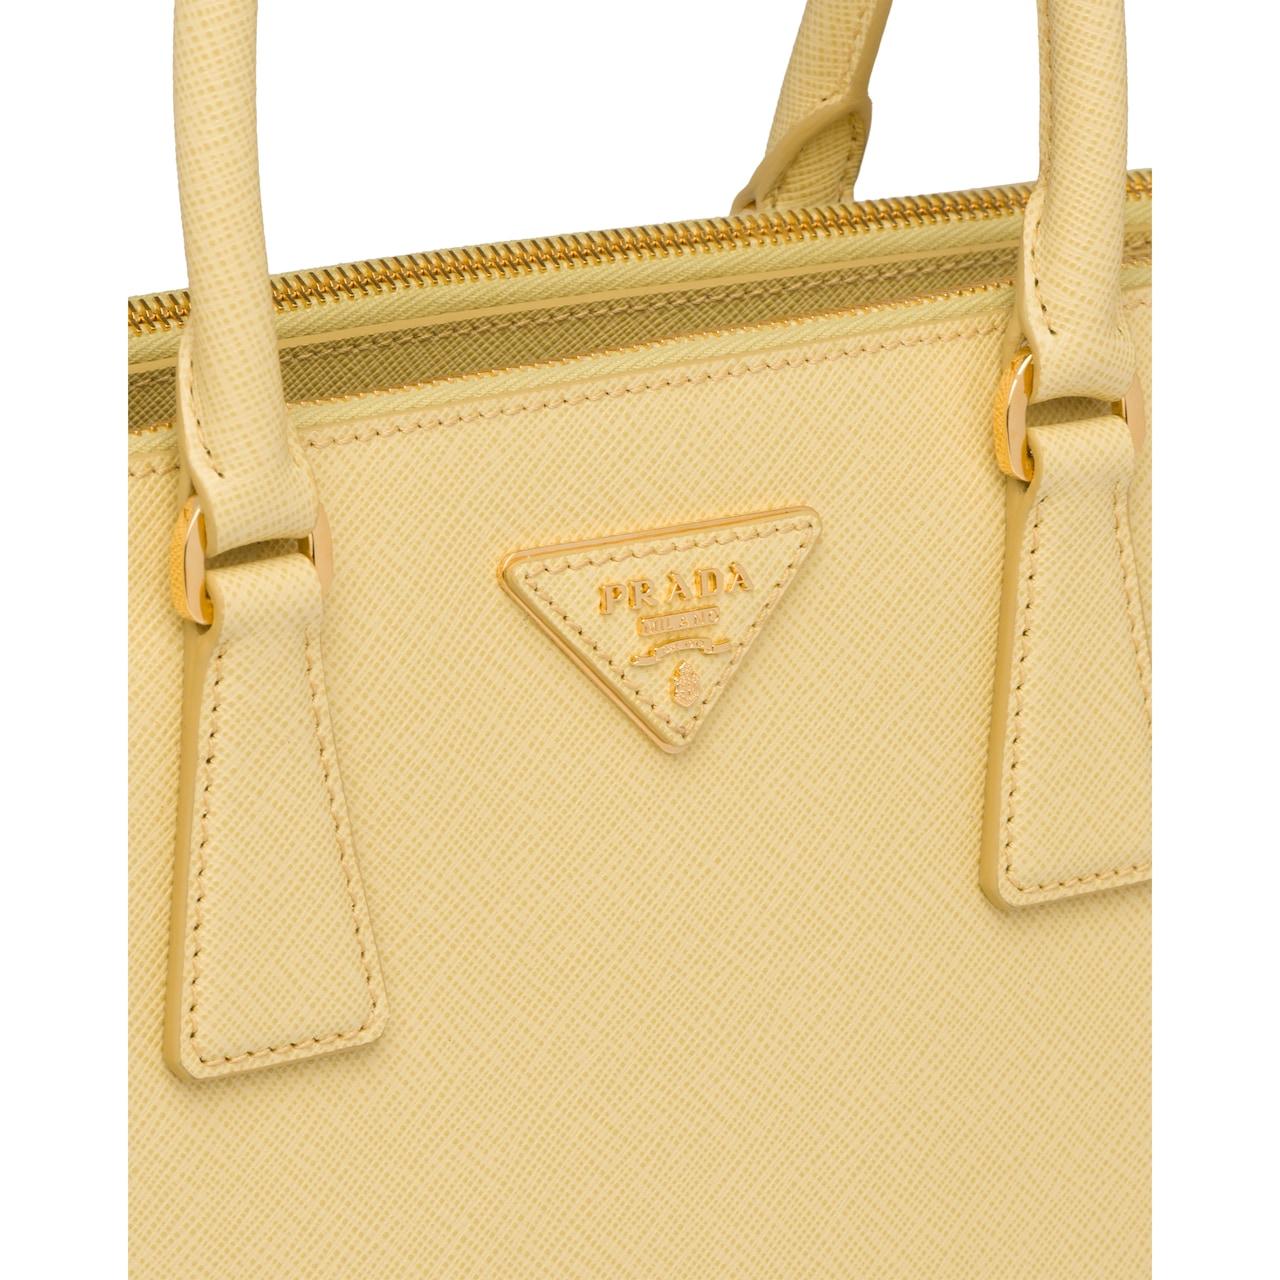 Prada Galleria Small Saffiano Leather Bag